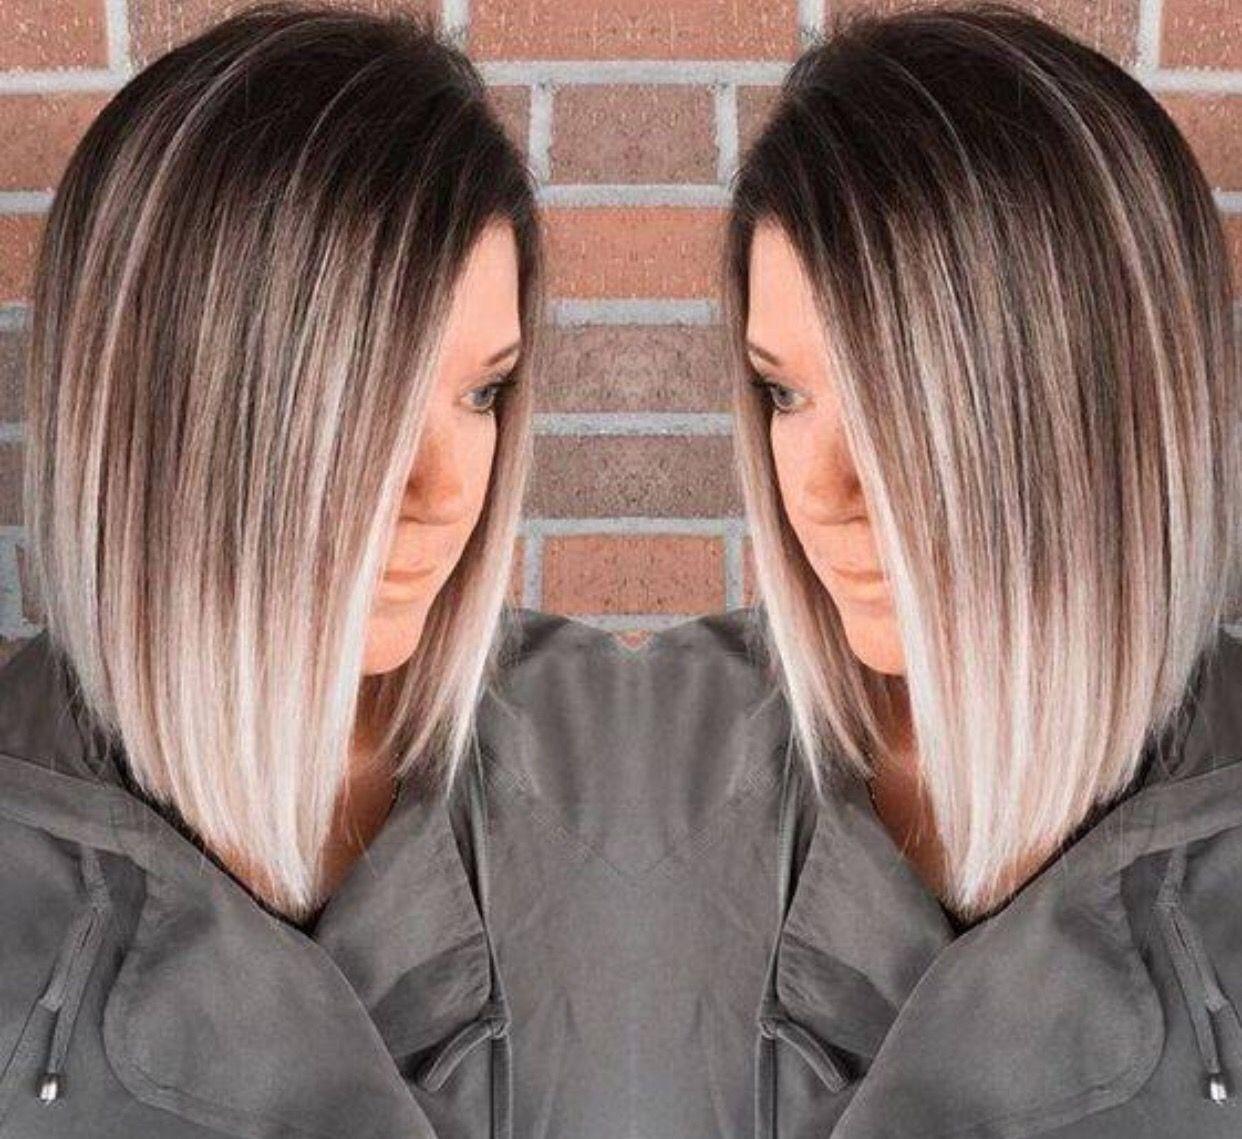 Ballayage Blond dedans pinmacee danielle bailey on hair | pinterest | hair coloring